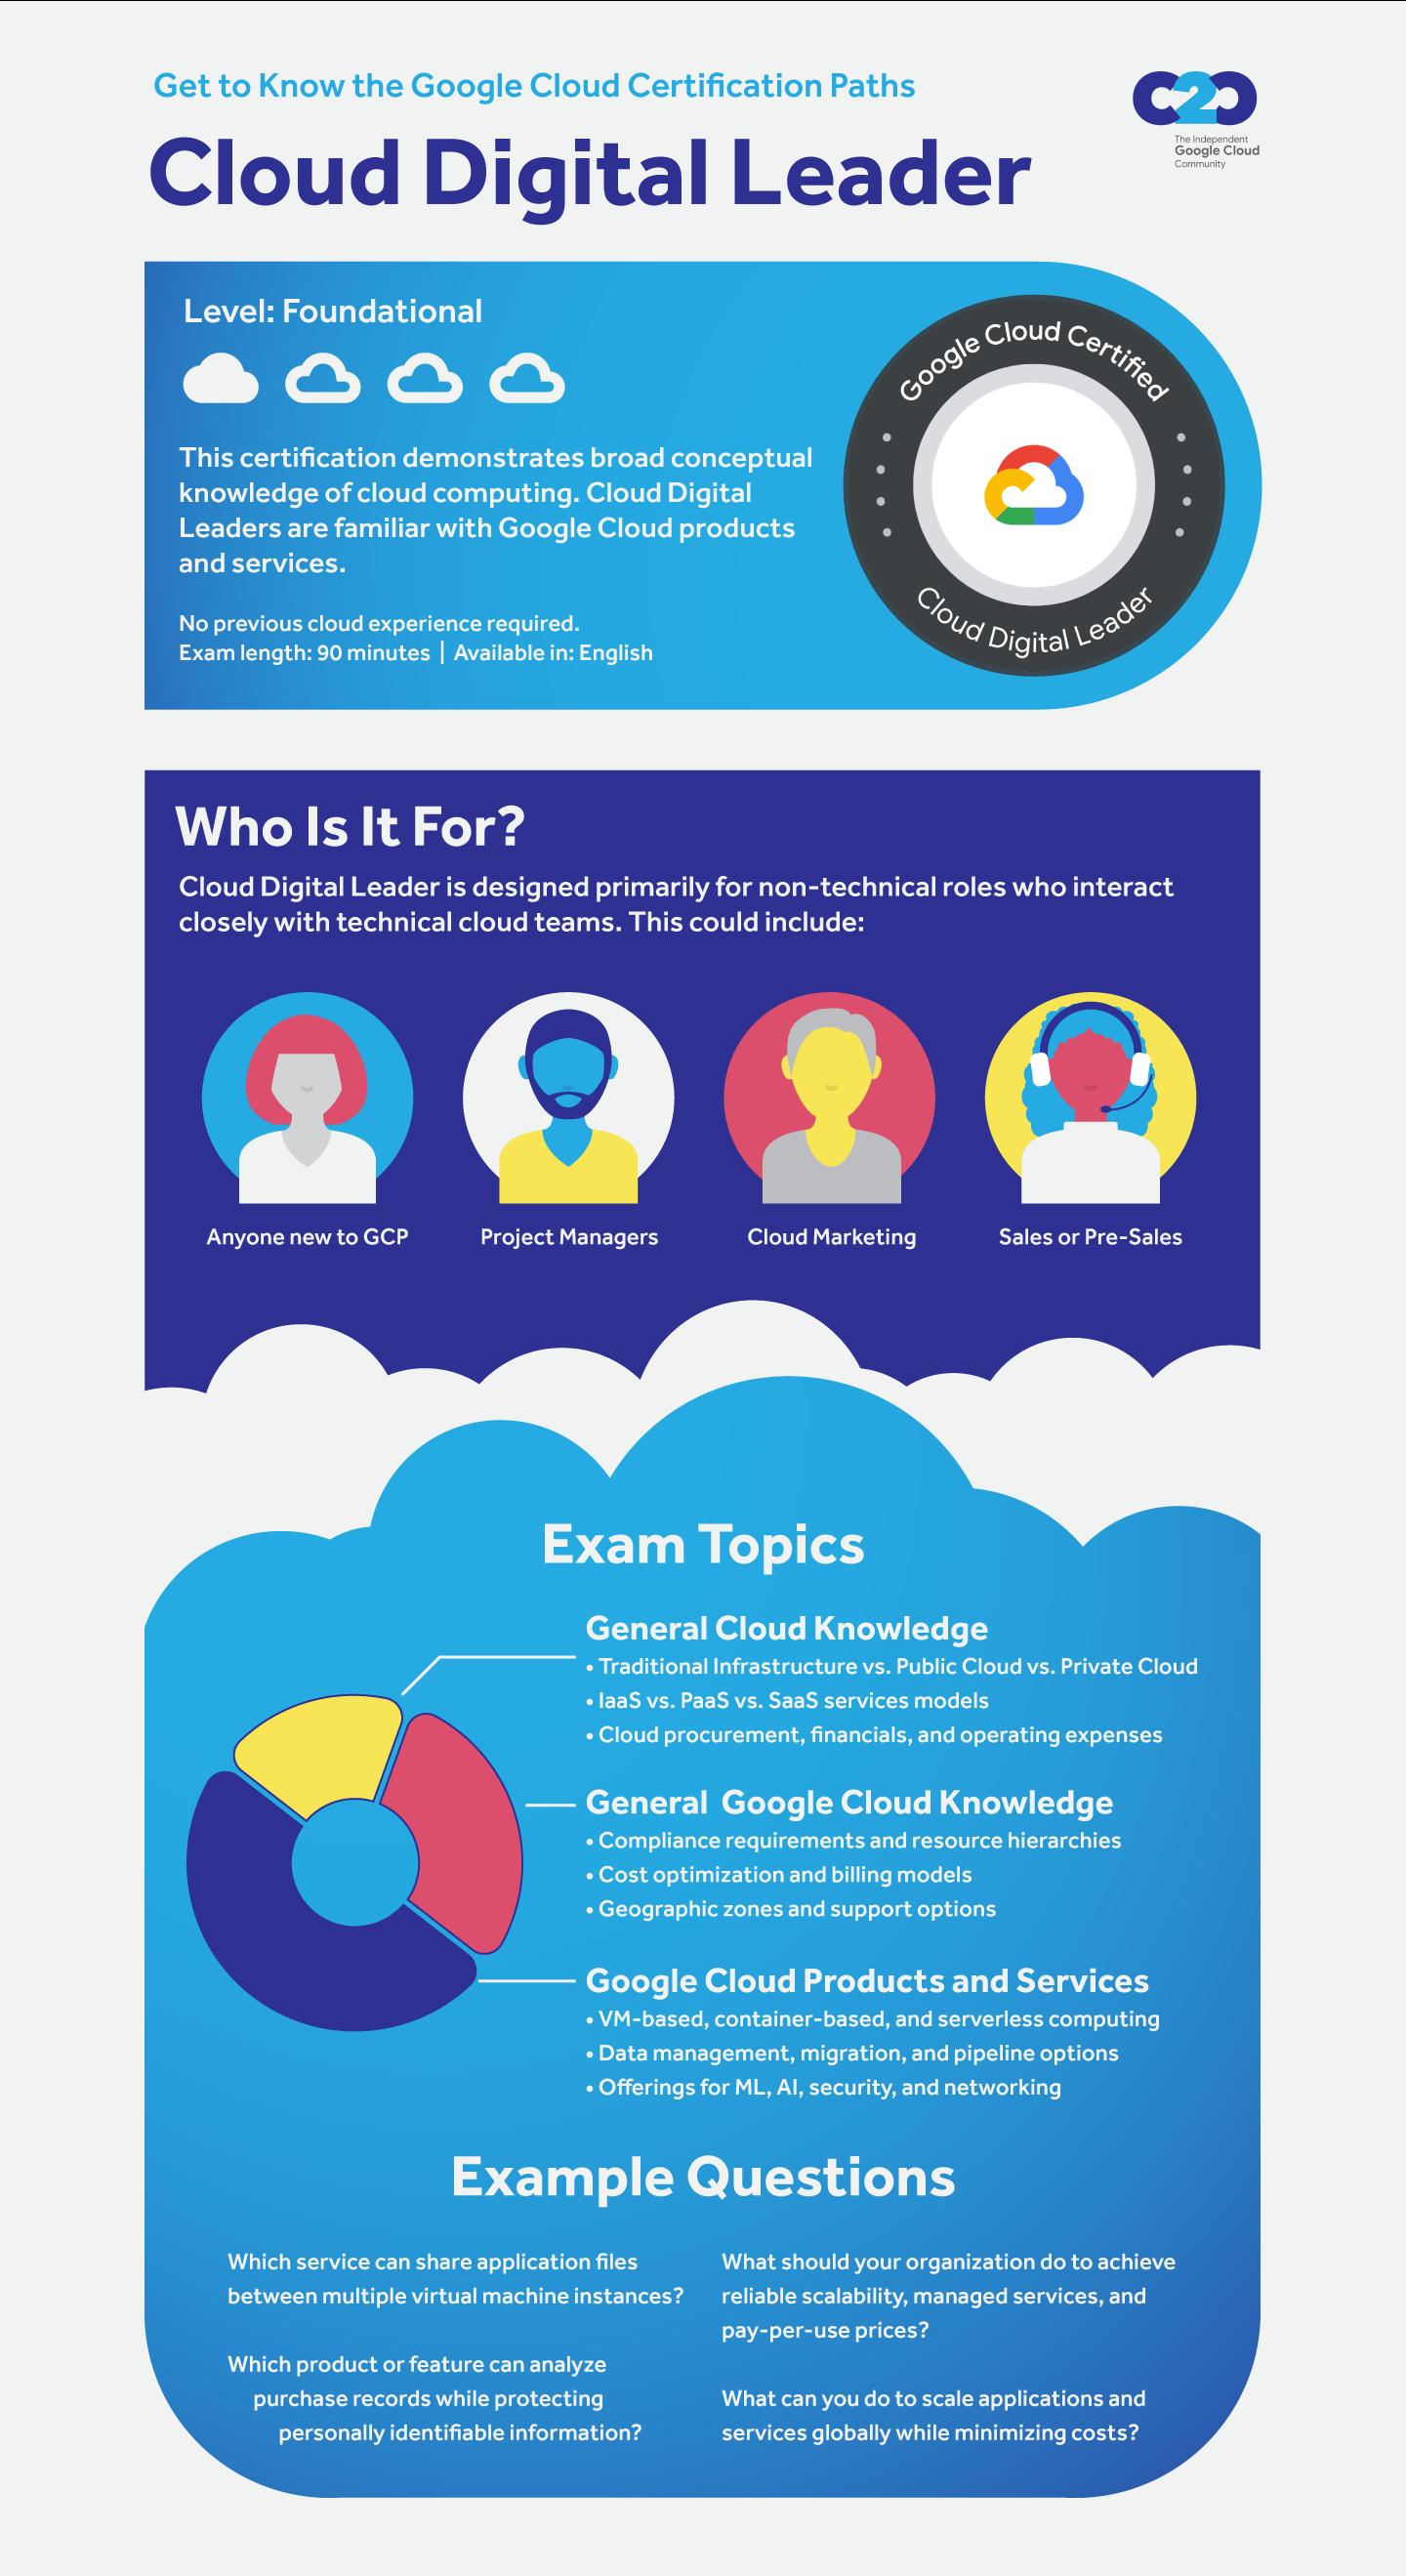 Infographic describing an overview of Google Cloud Digital Leader certification.